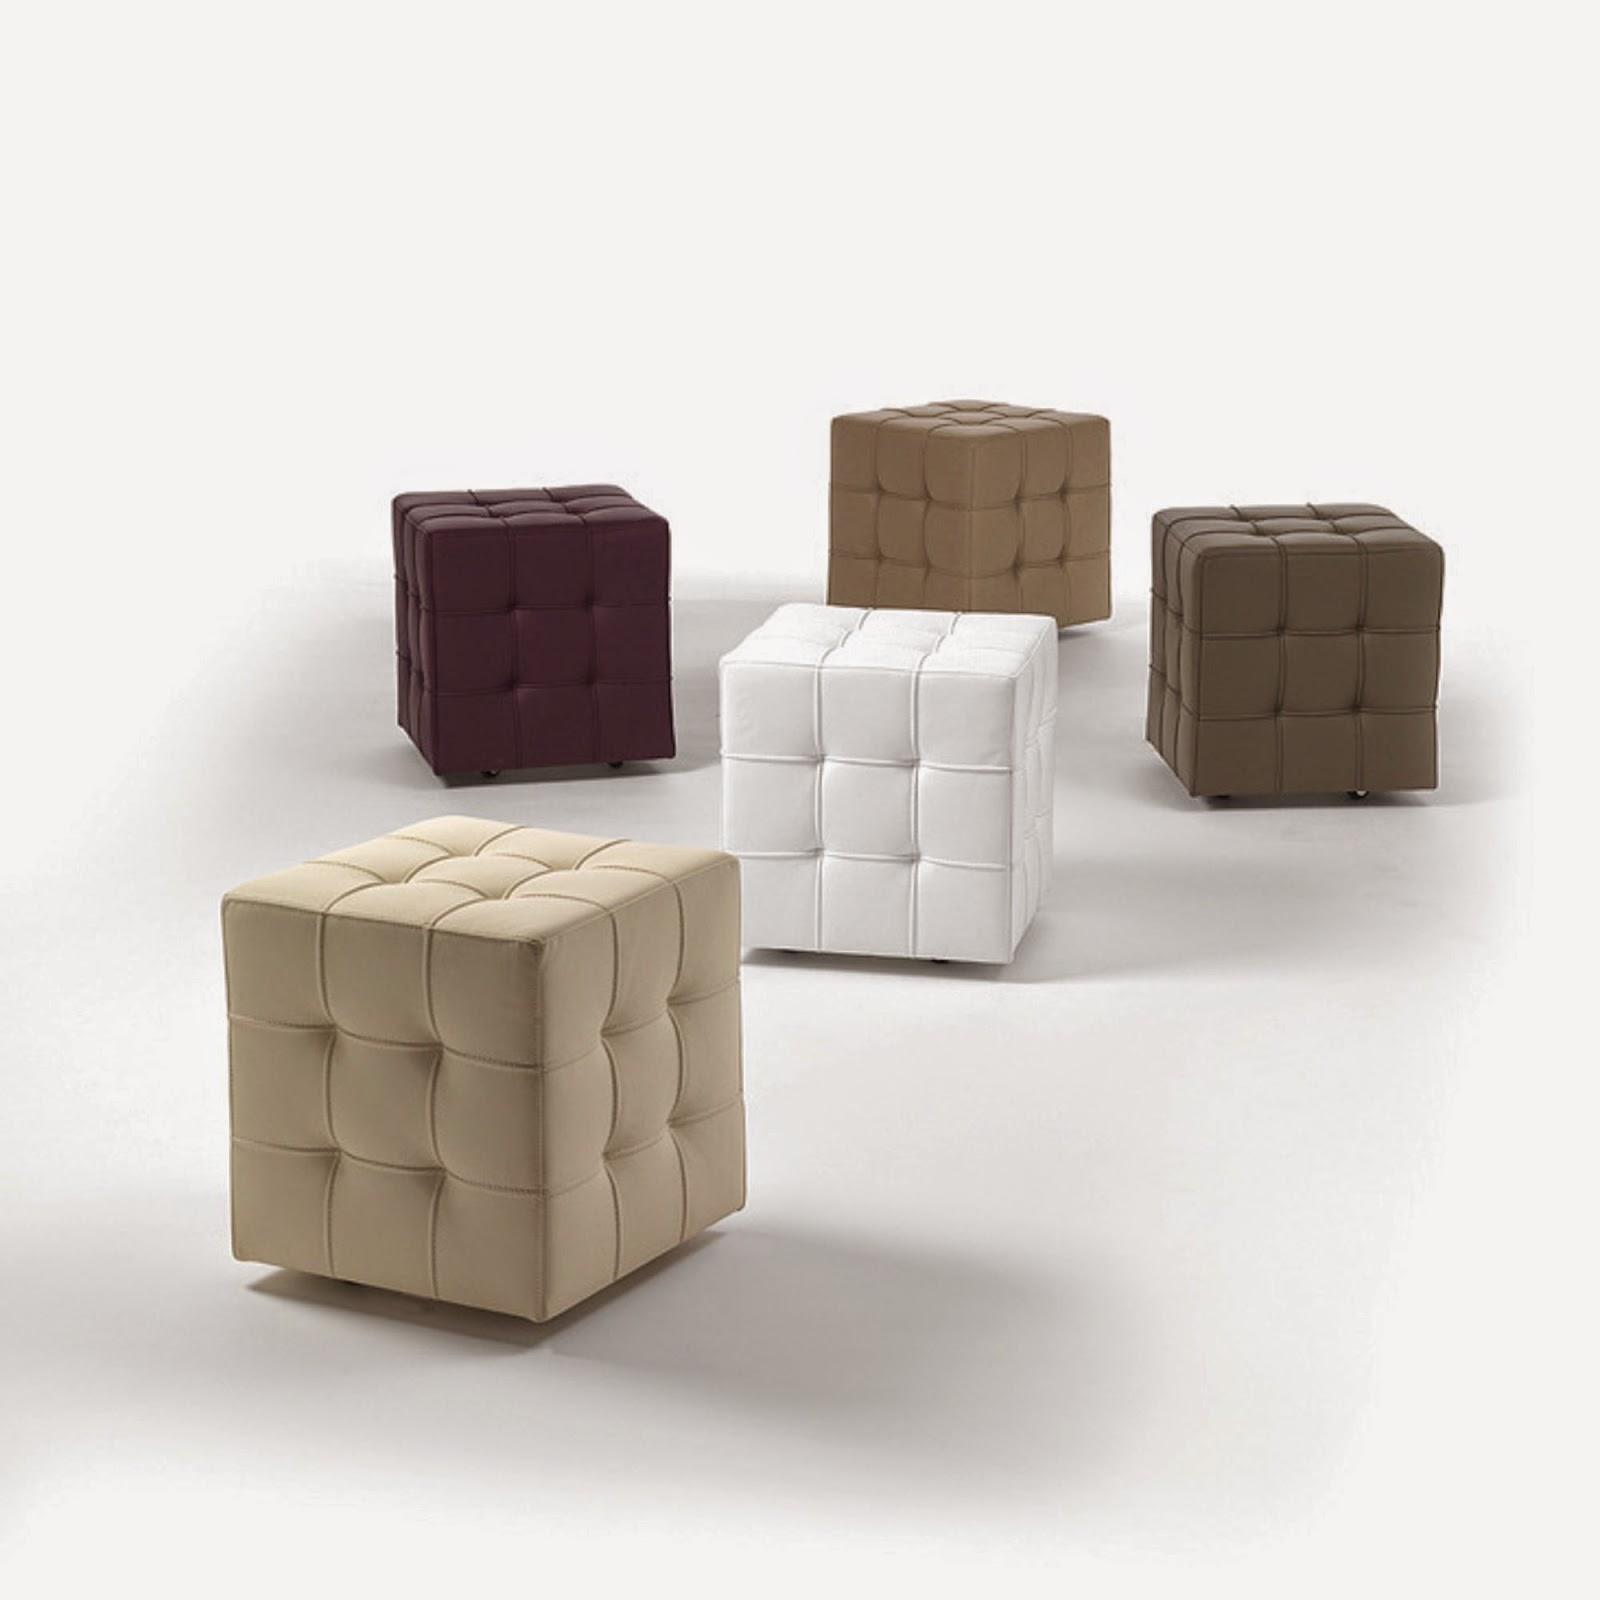 pouf bob pouff cattelan italia italian furniture. Black Bedroom Furniture Sets. Home Design Ideas